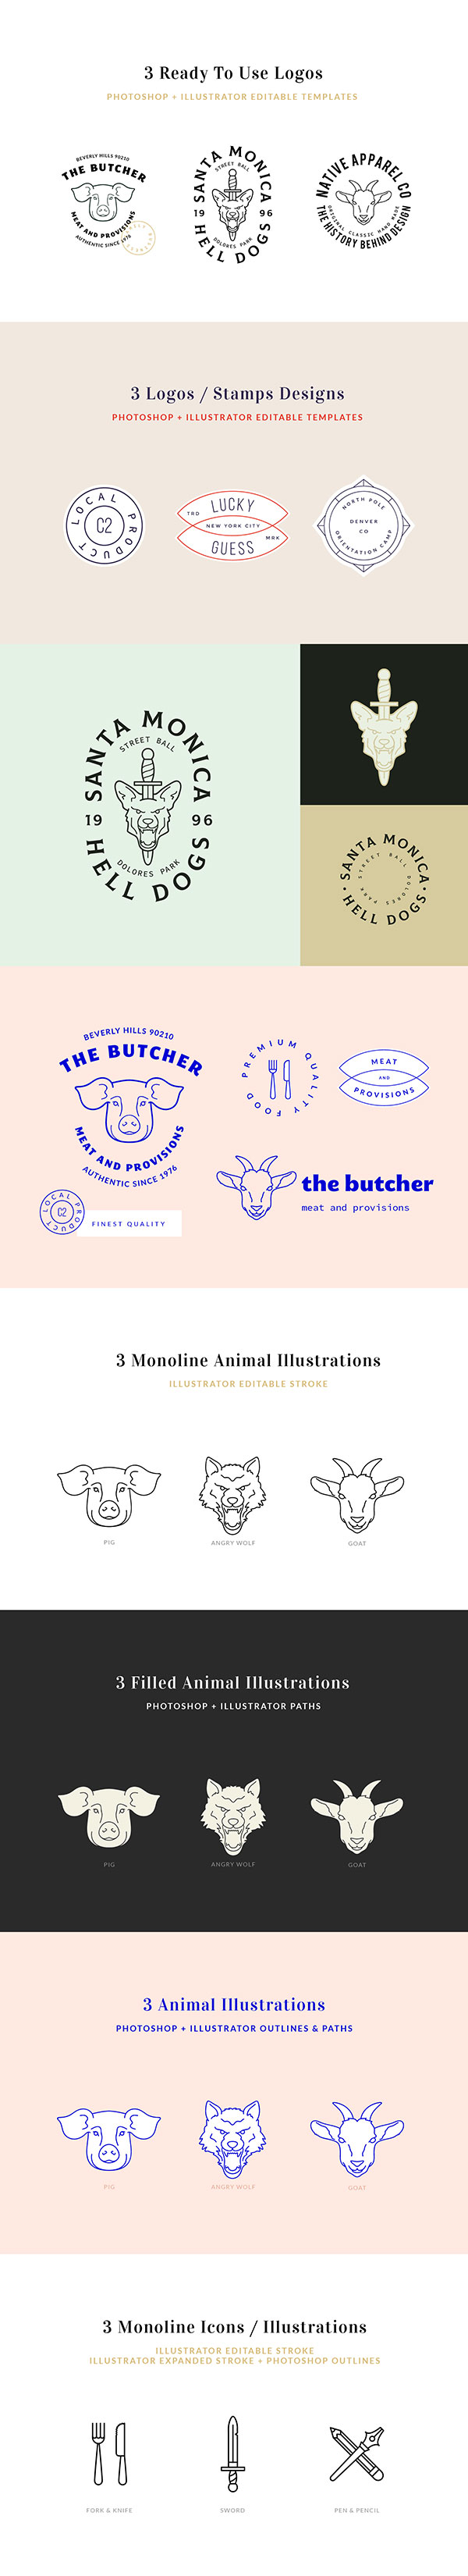 The Logo Kit – Free Sample | GraphicBurger